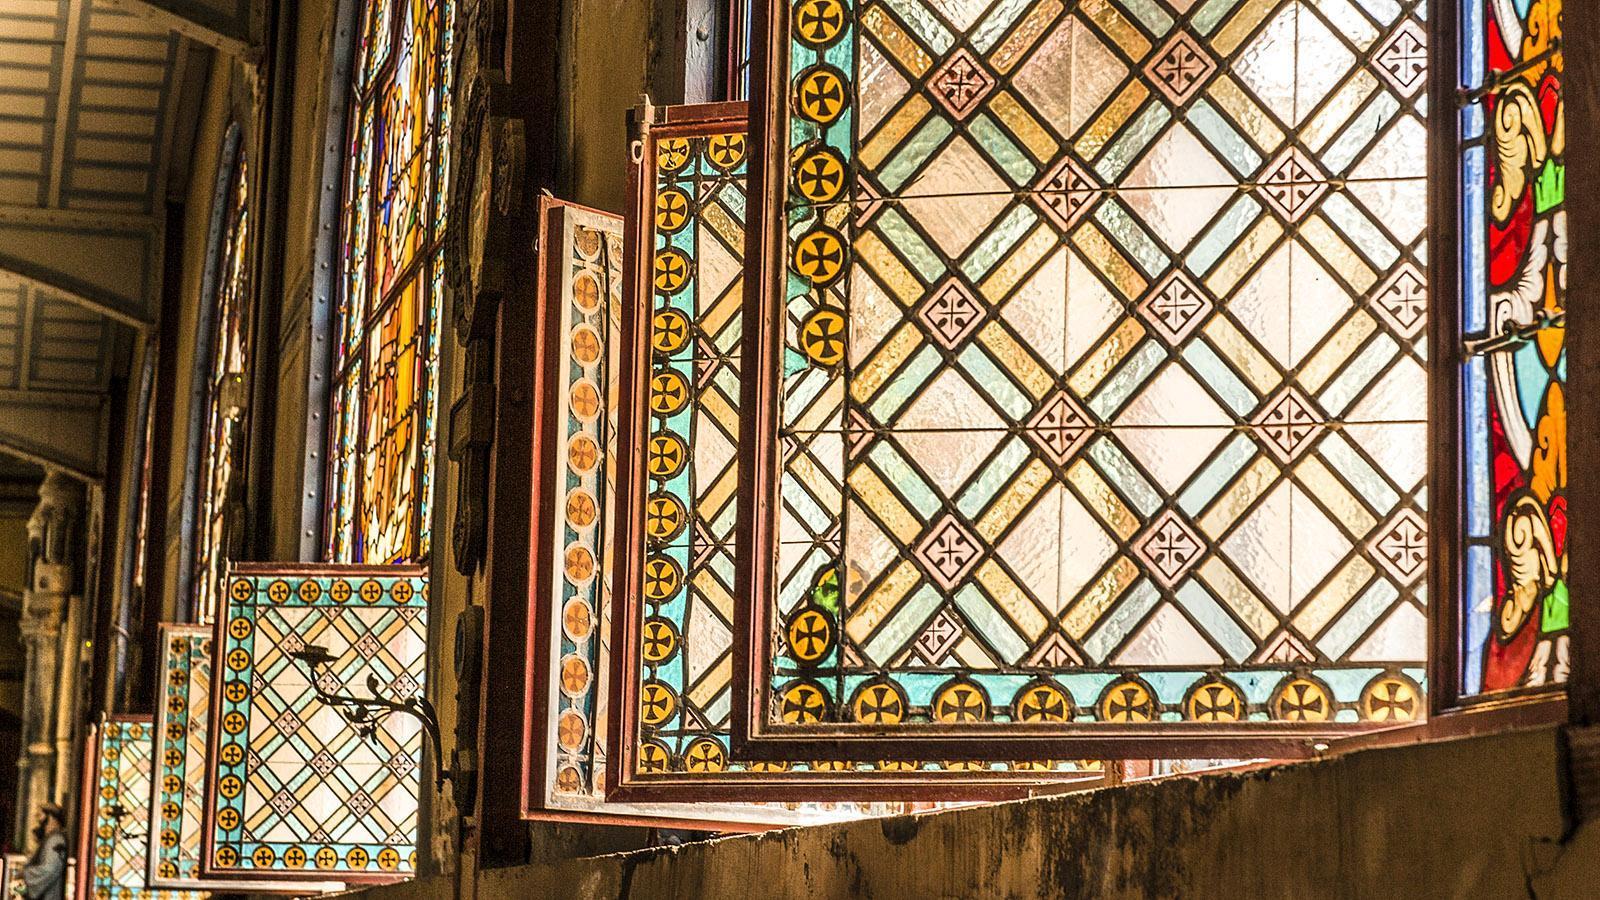 Die Buntglasfenster der Kathedrale von Fort-de-France. Foto: Hilke Maunder